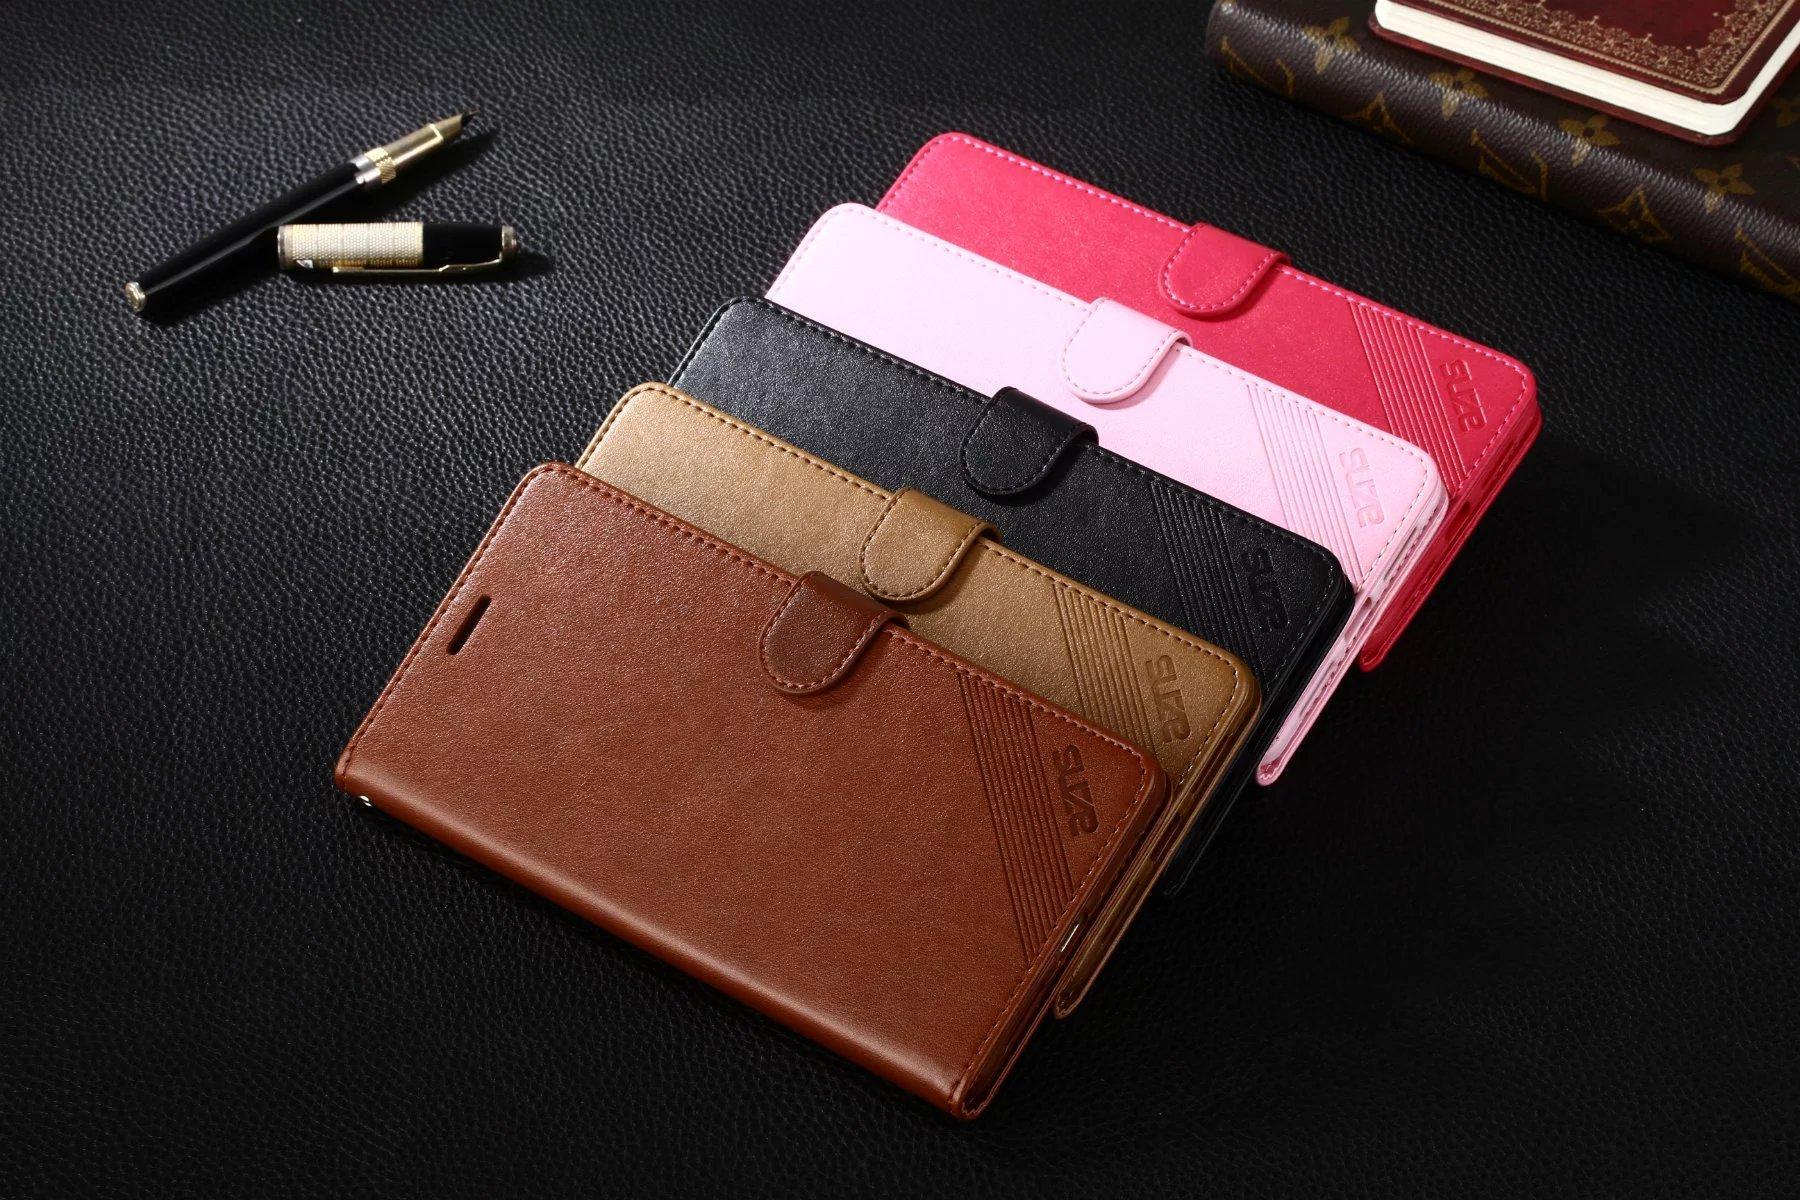 Xiaomi 맥스 케이스 백 커버 플립 스탠드 클립 슬림 귀여운 럭셔리 지갑 지갑 Xiaomi Mi Max